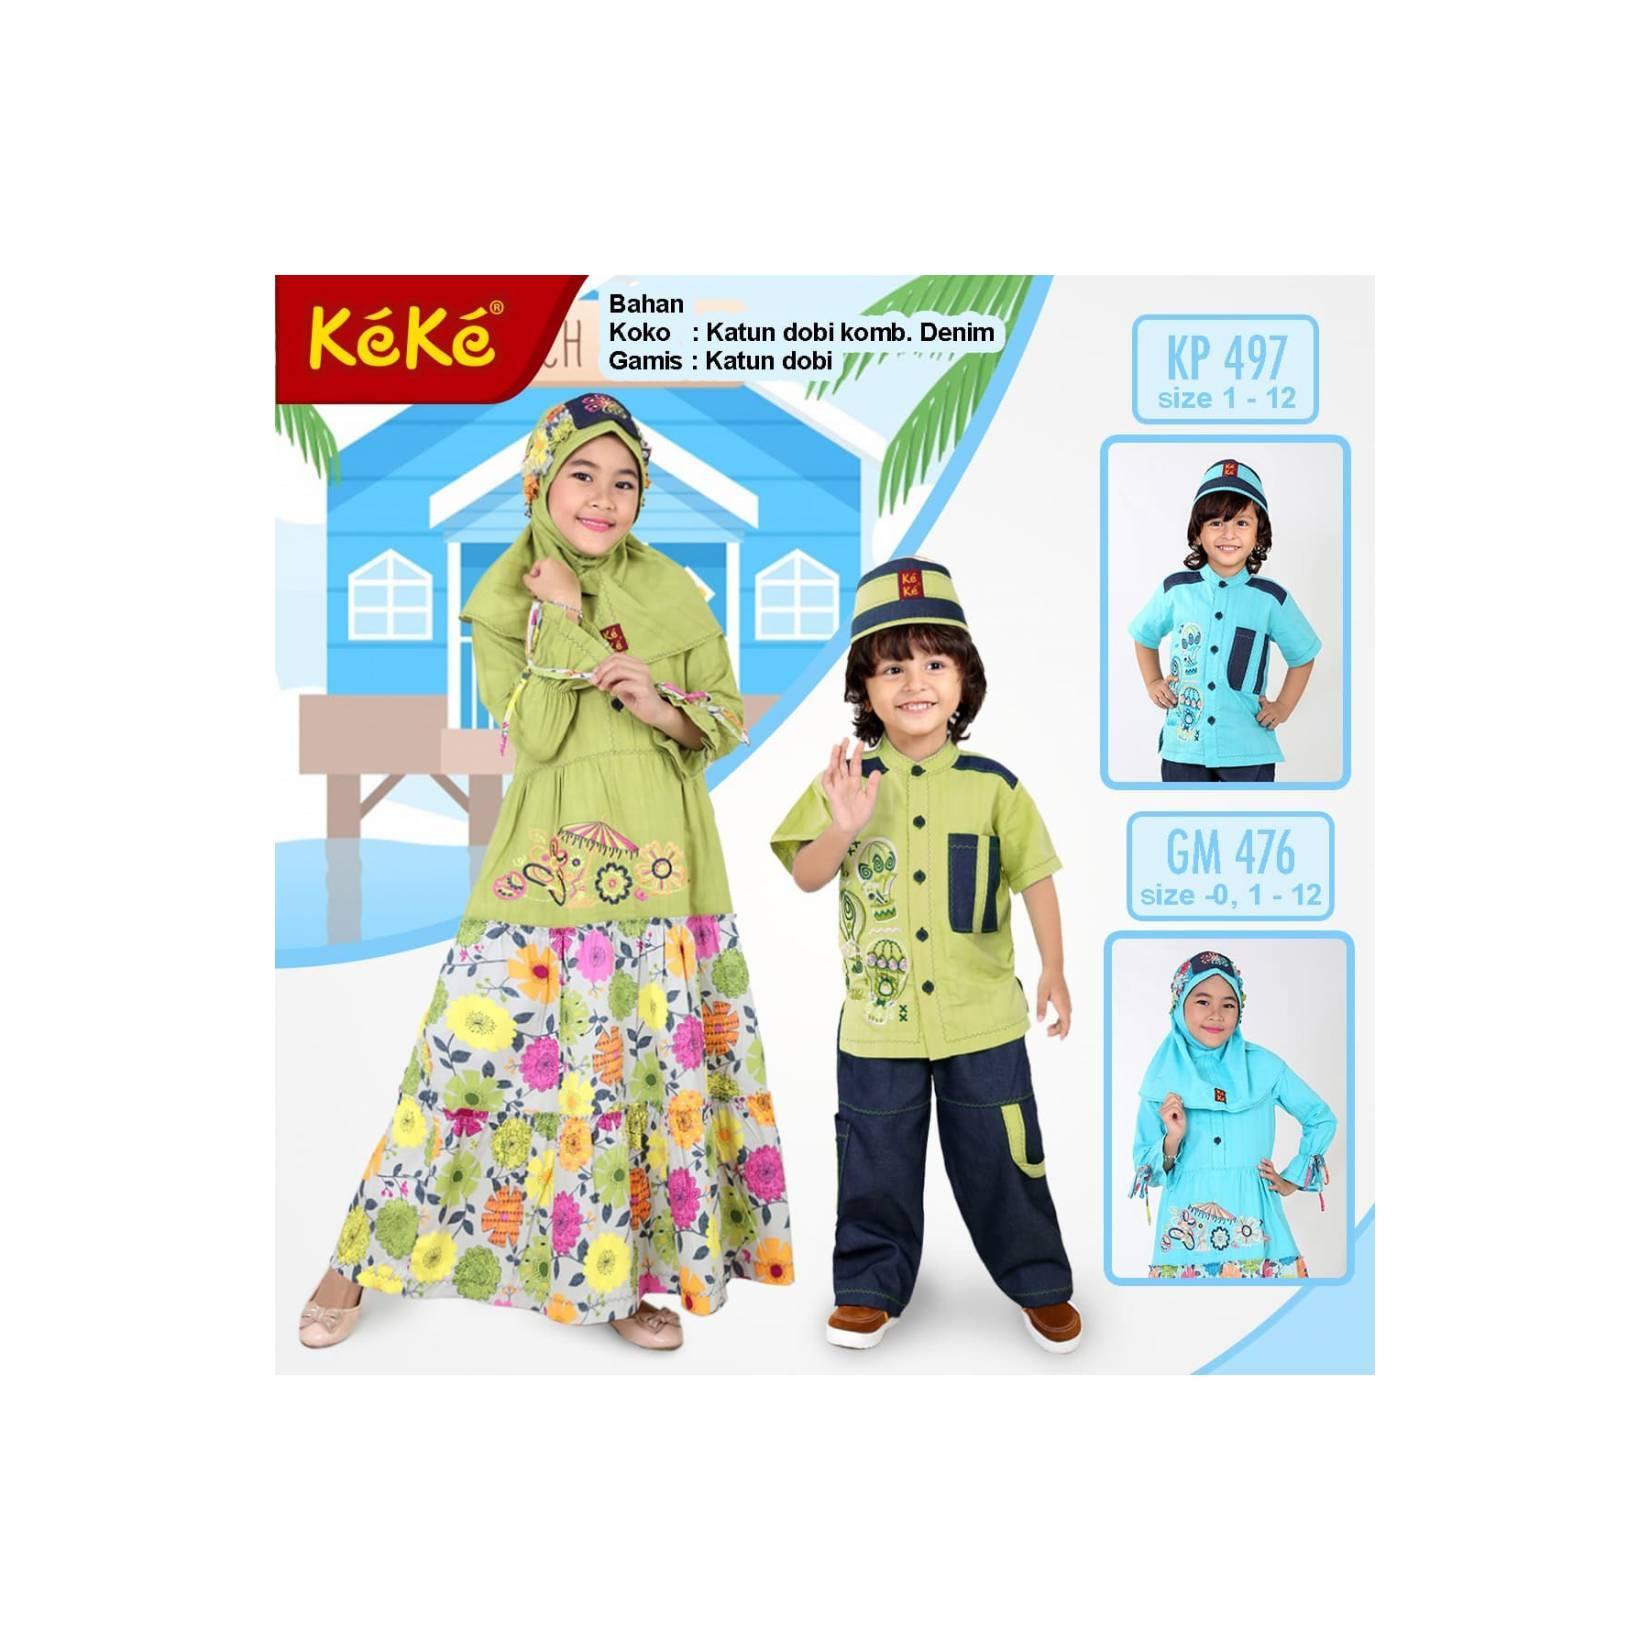 gamis anak/baju muslim anak keke size 10